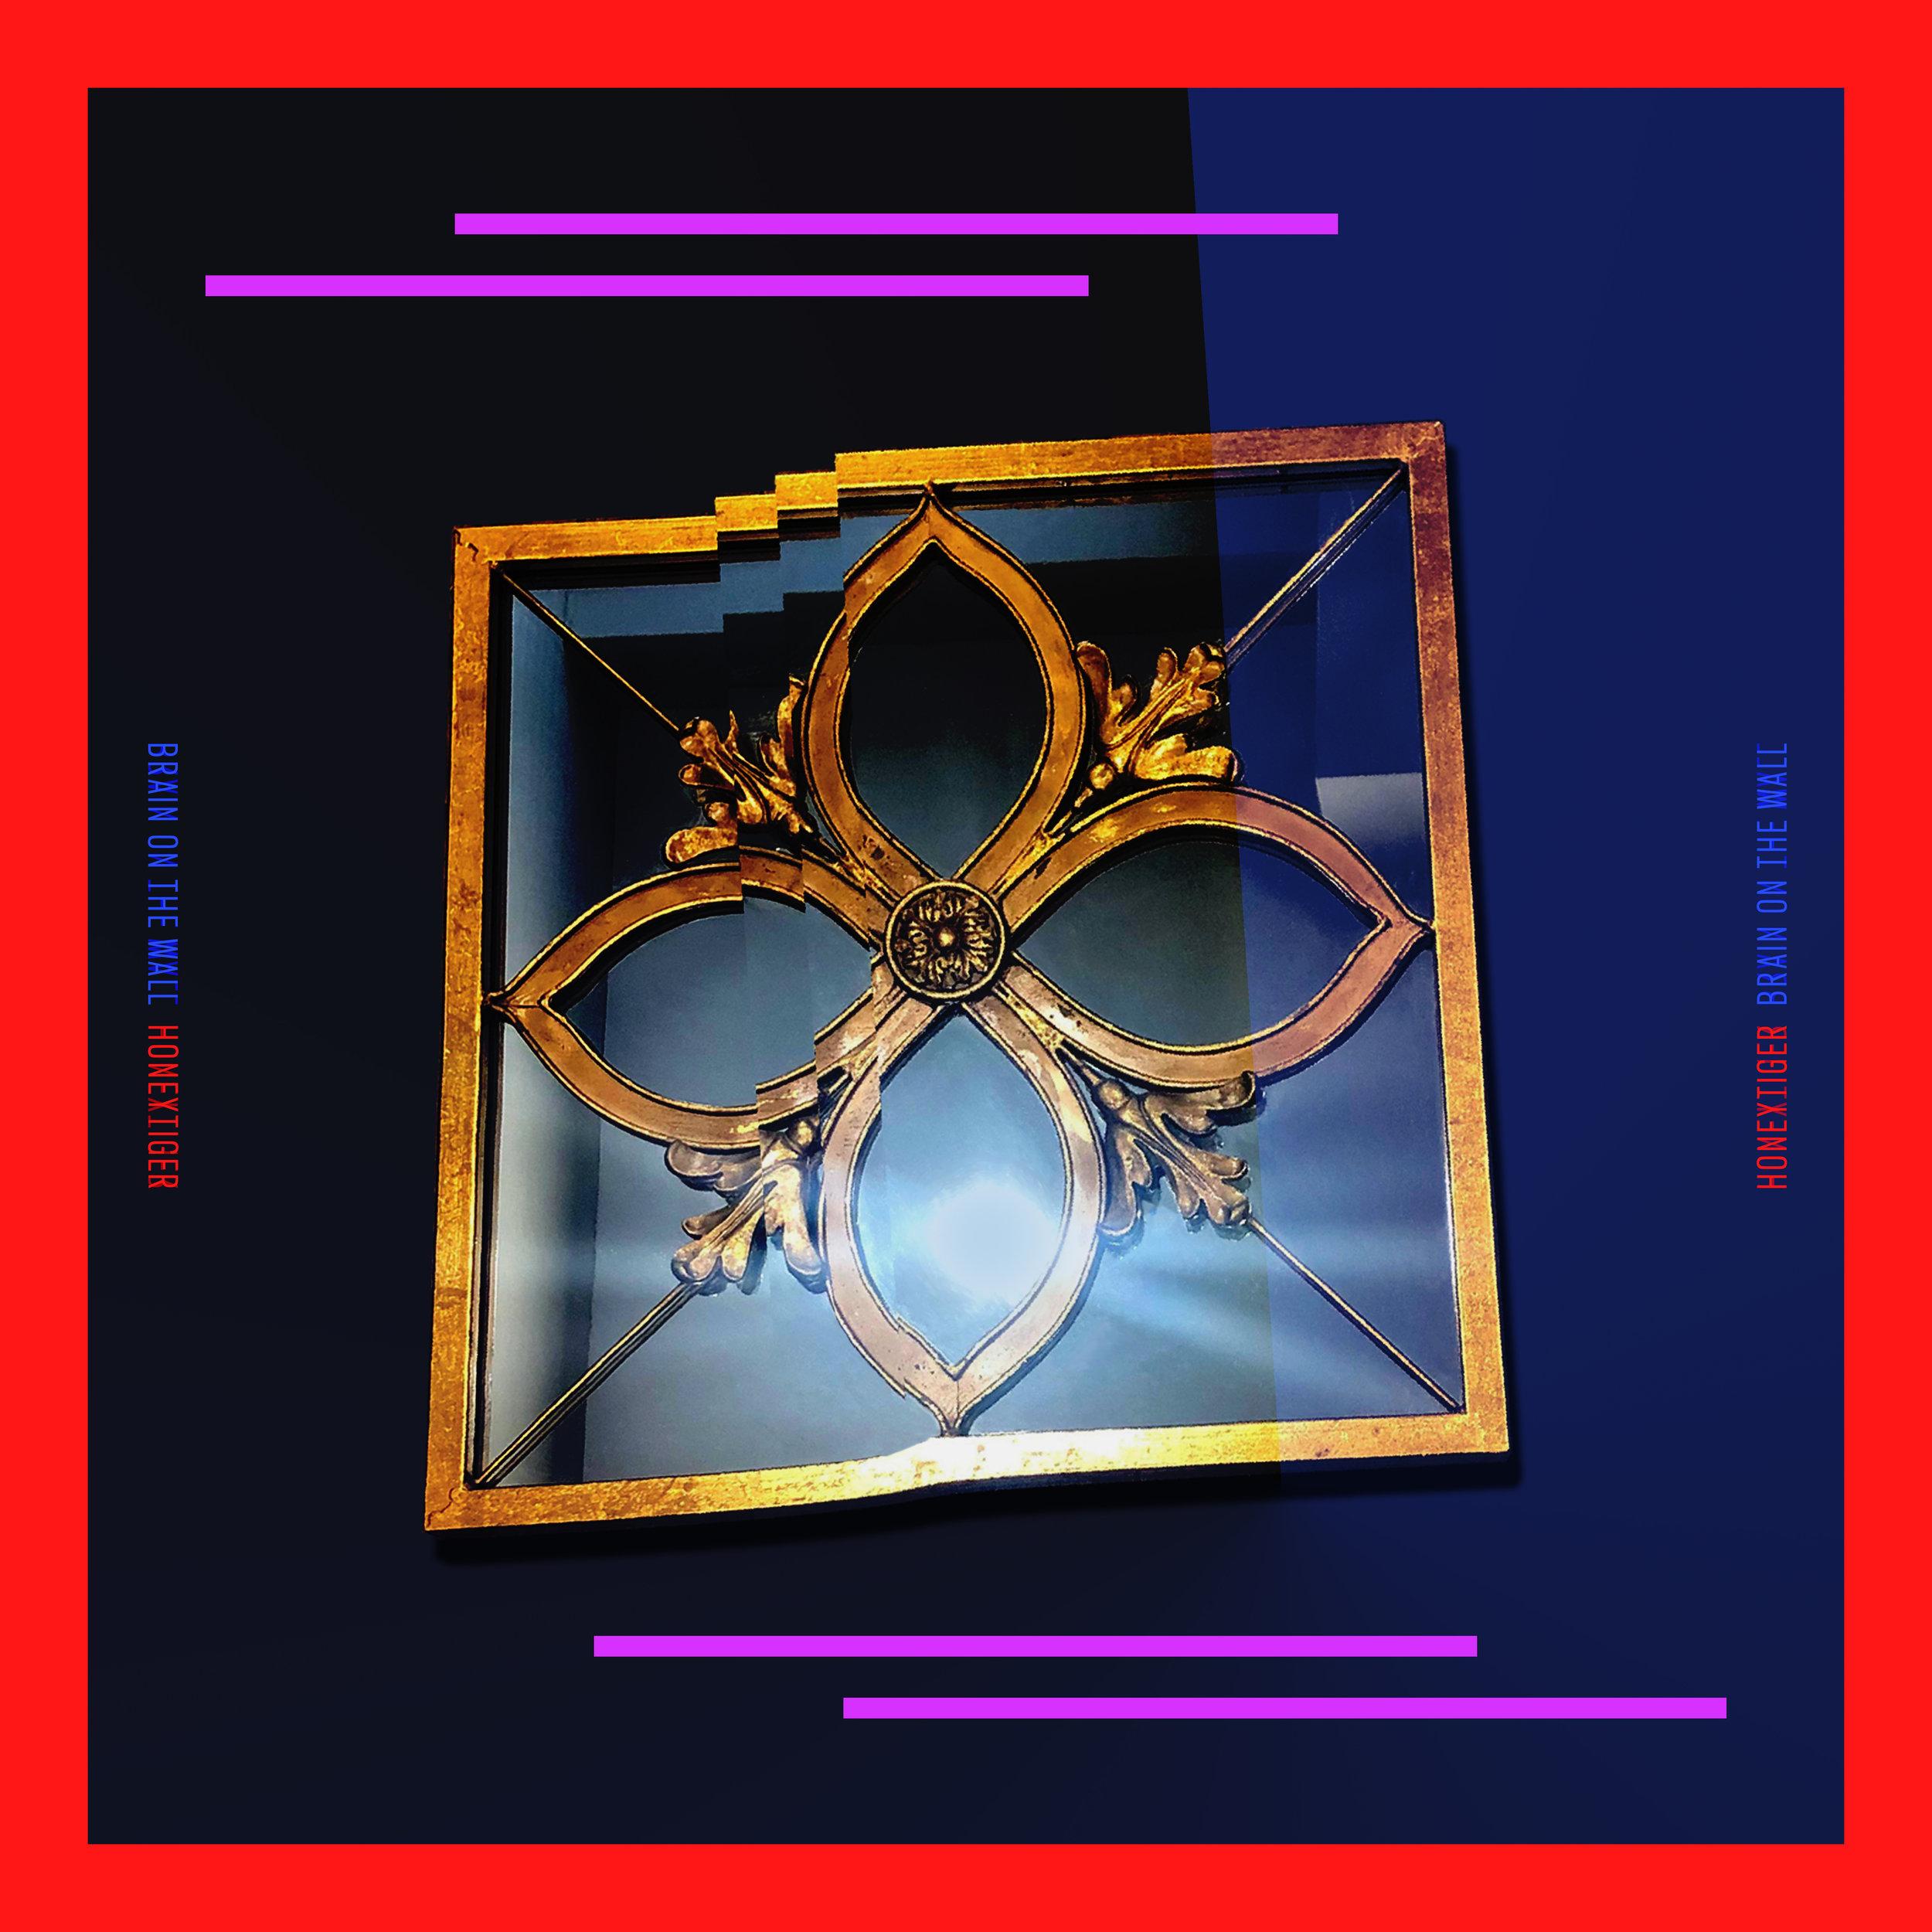 BOTW-Album-Art-Final-FullSize.jpg